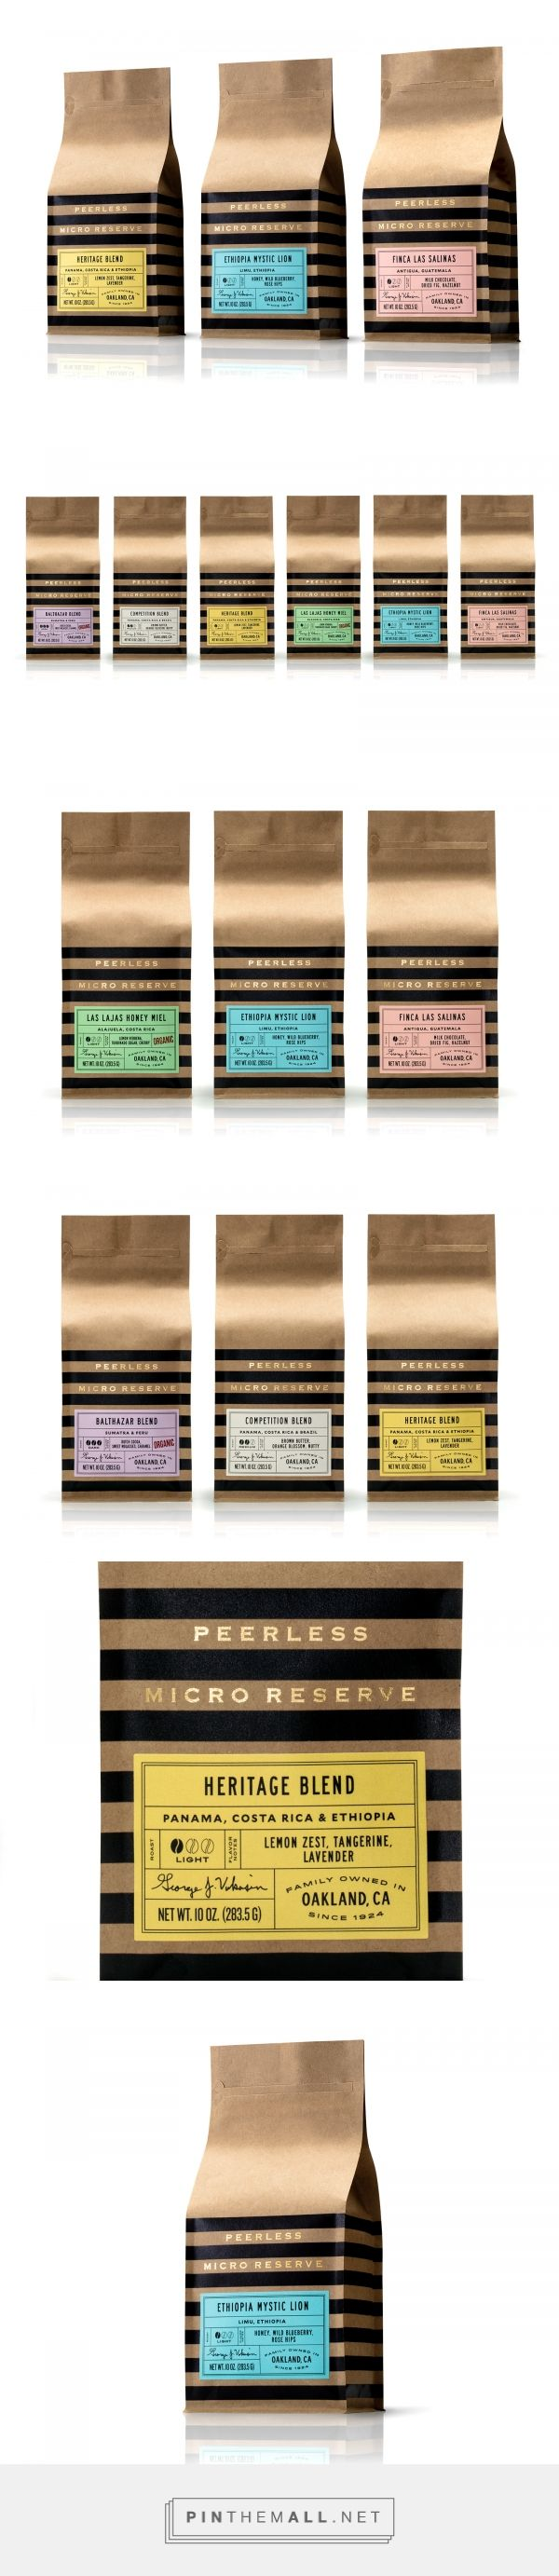 Peerless Micro Reserve packaging design by Pavement - http://www.packagingoftheworld.com/2018/01/peerless-micro-reserve.html